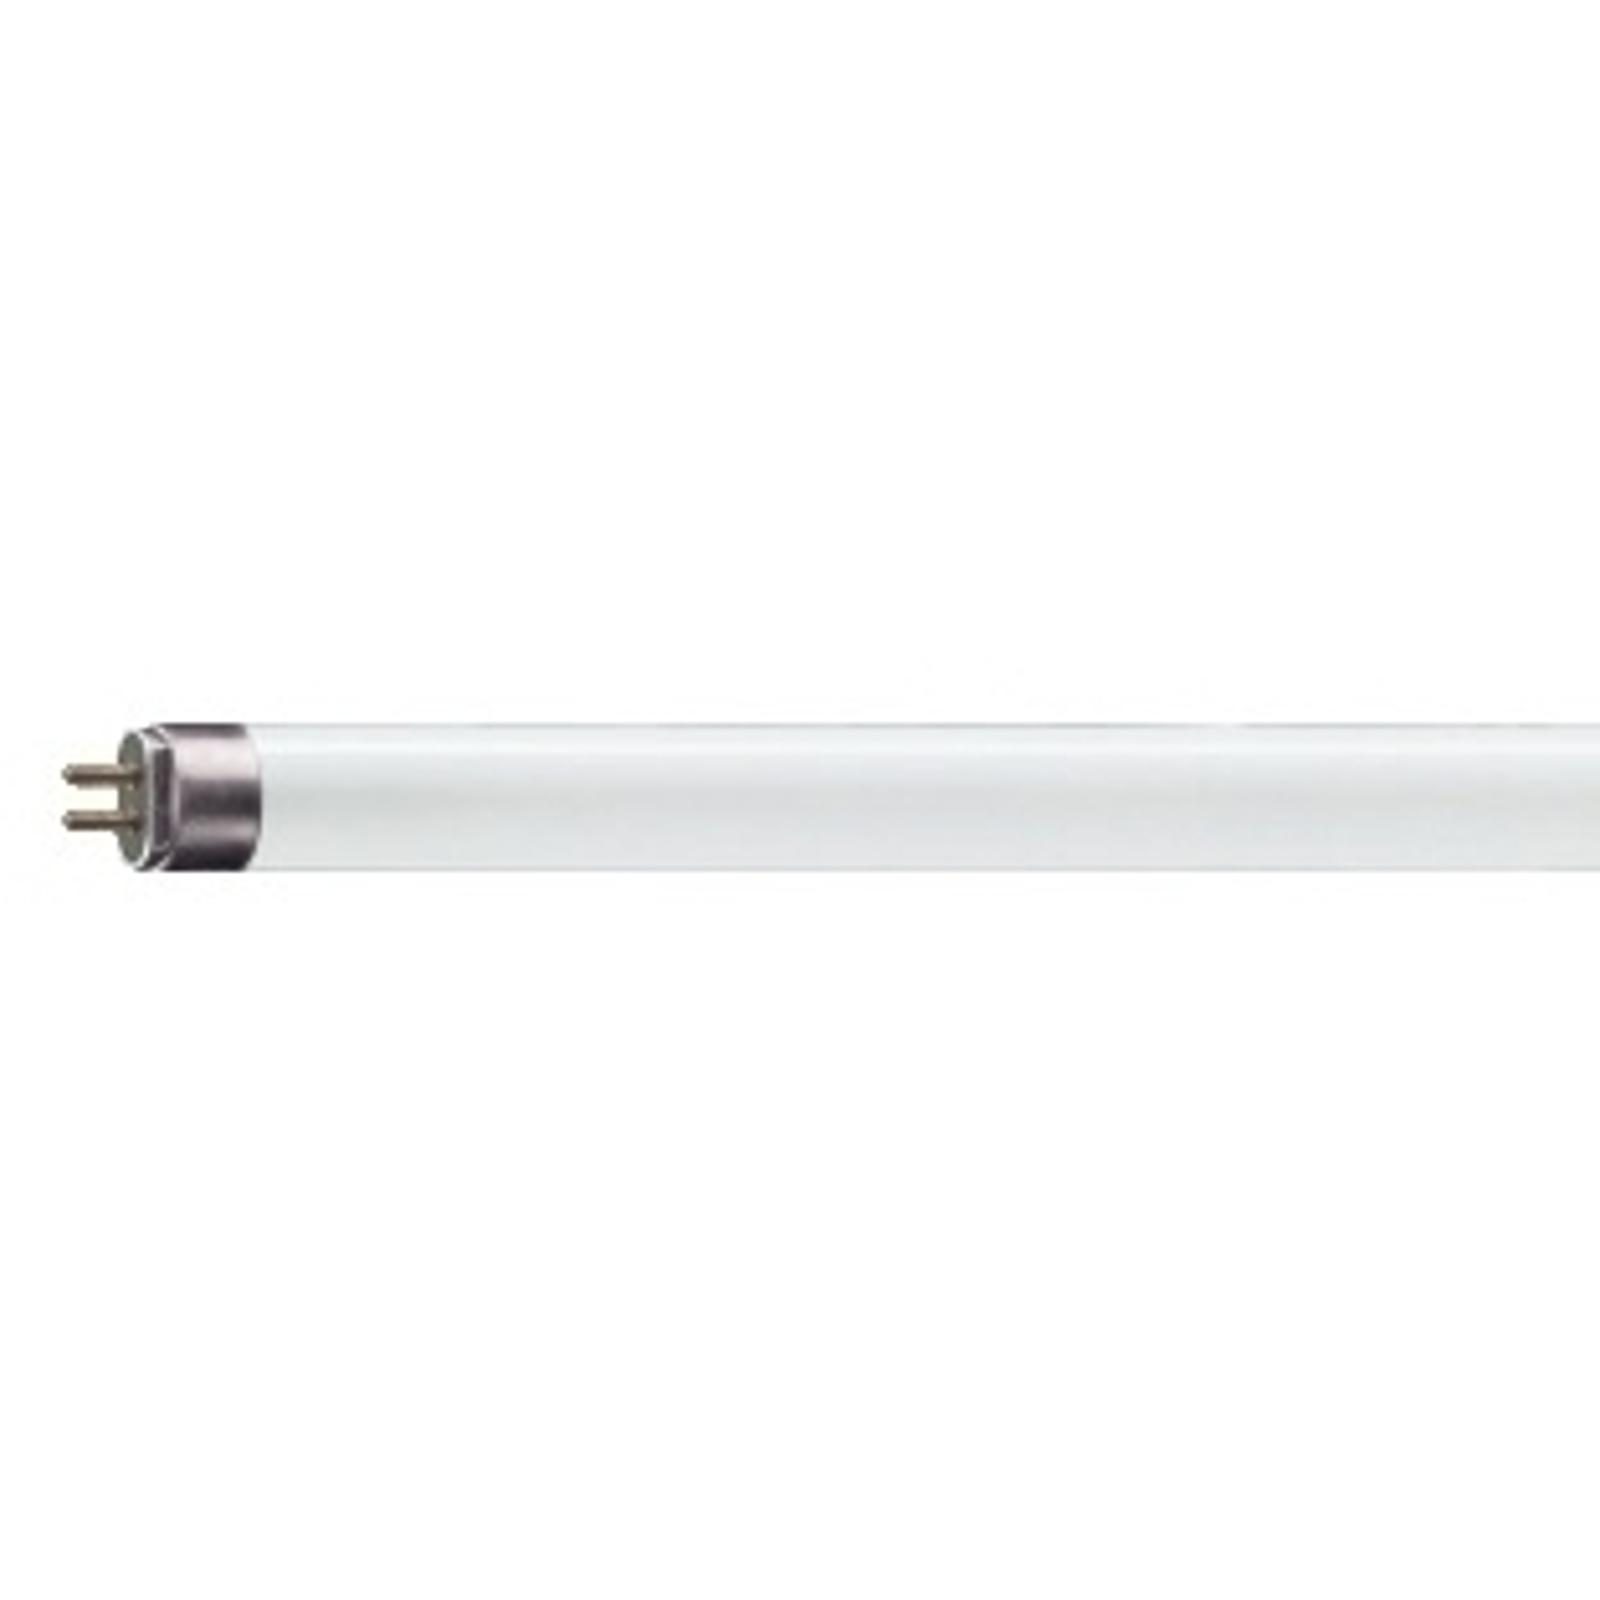 Philips Master G5 T5 Mini Leuchtstoffröhre 4W 640